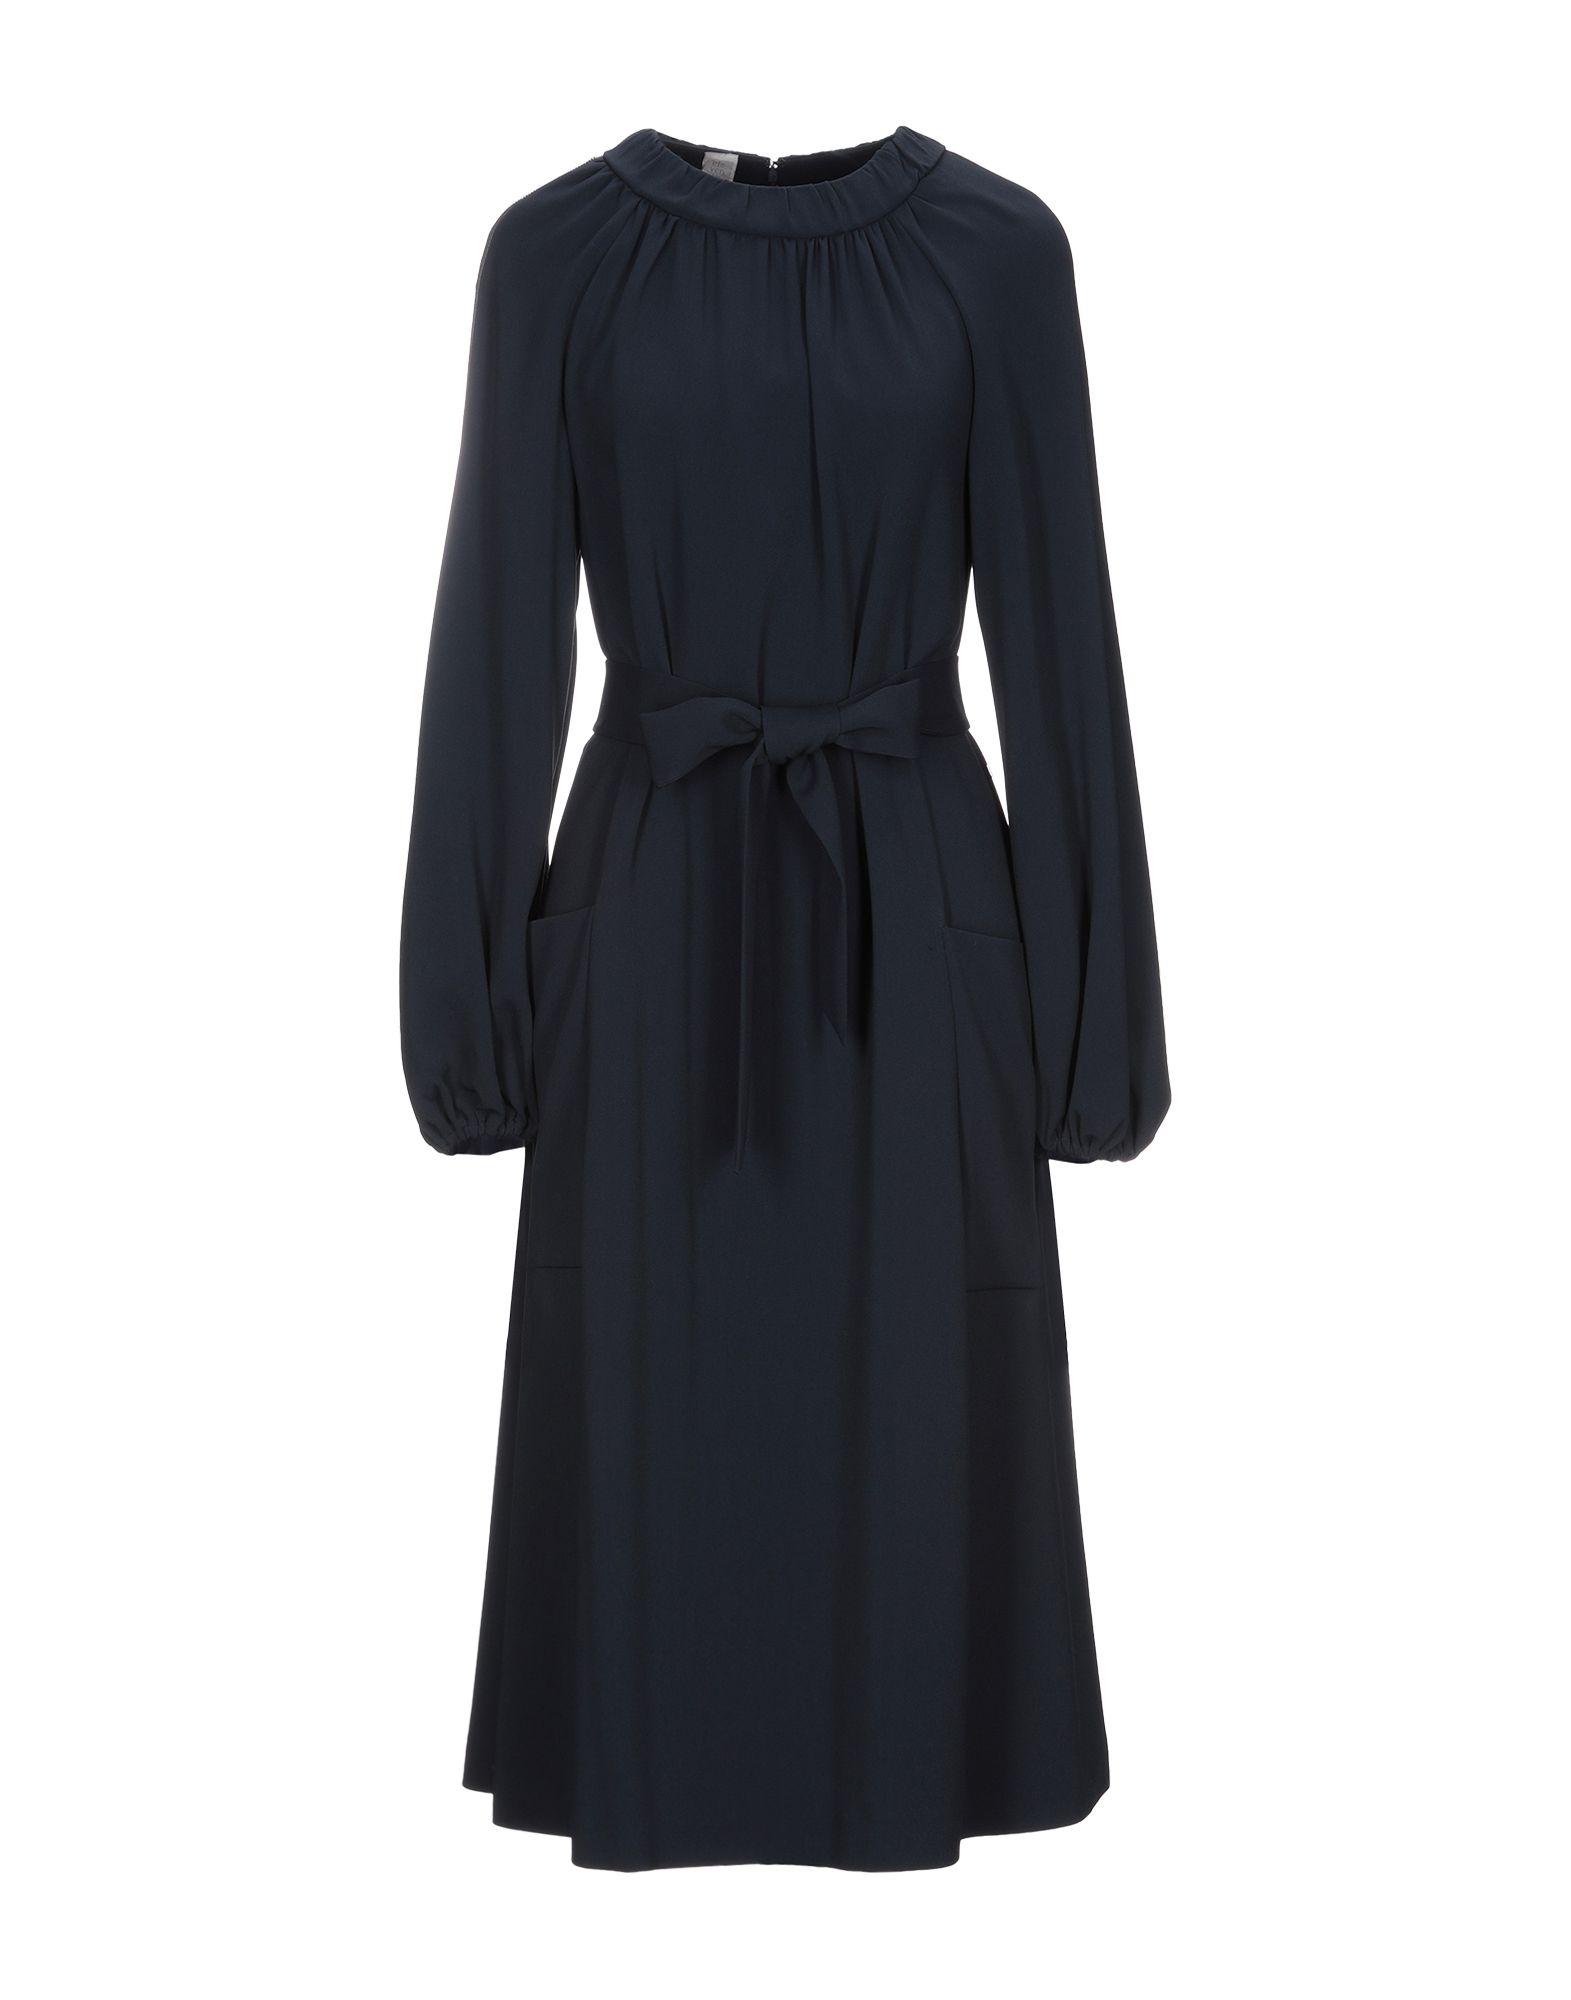 ELEVENTY 3/4 length dresses. crepe, belt, rhinestones, basic solid color, round collar, long sleeves, multipockets, rear closure, zipper closure, unlined, stretch. 51% Viscose, 46% Acetate, 3% Elastane